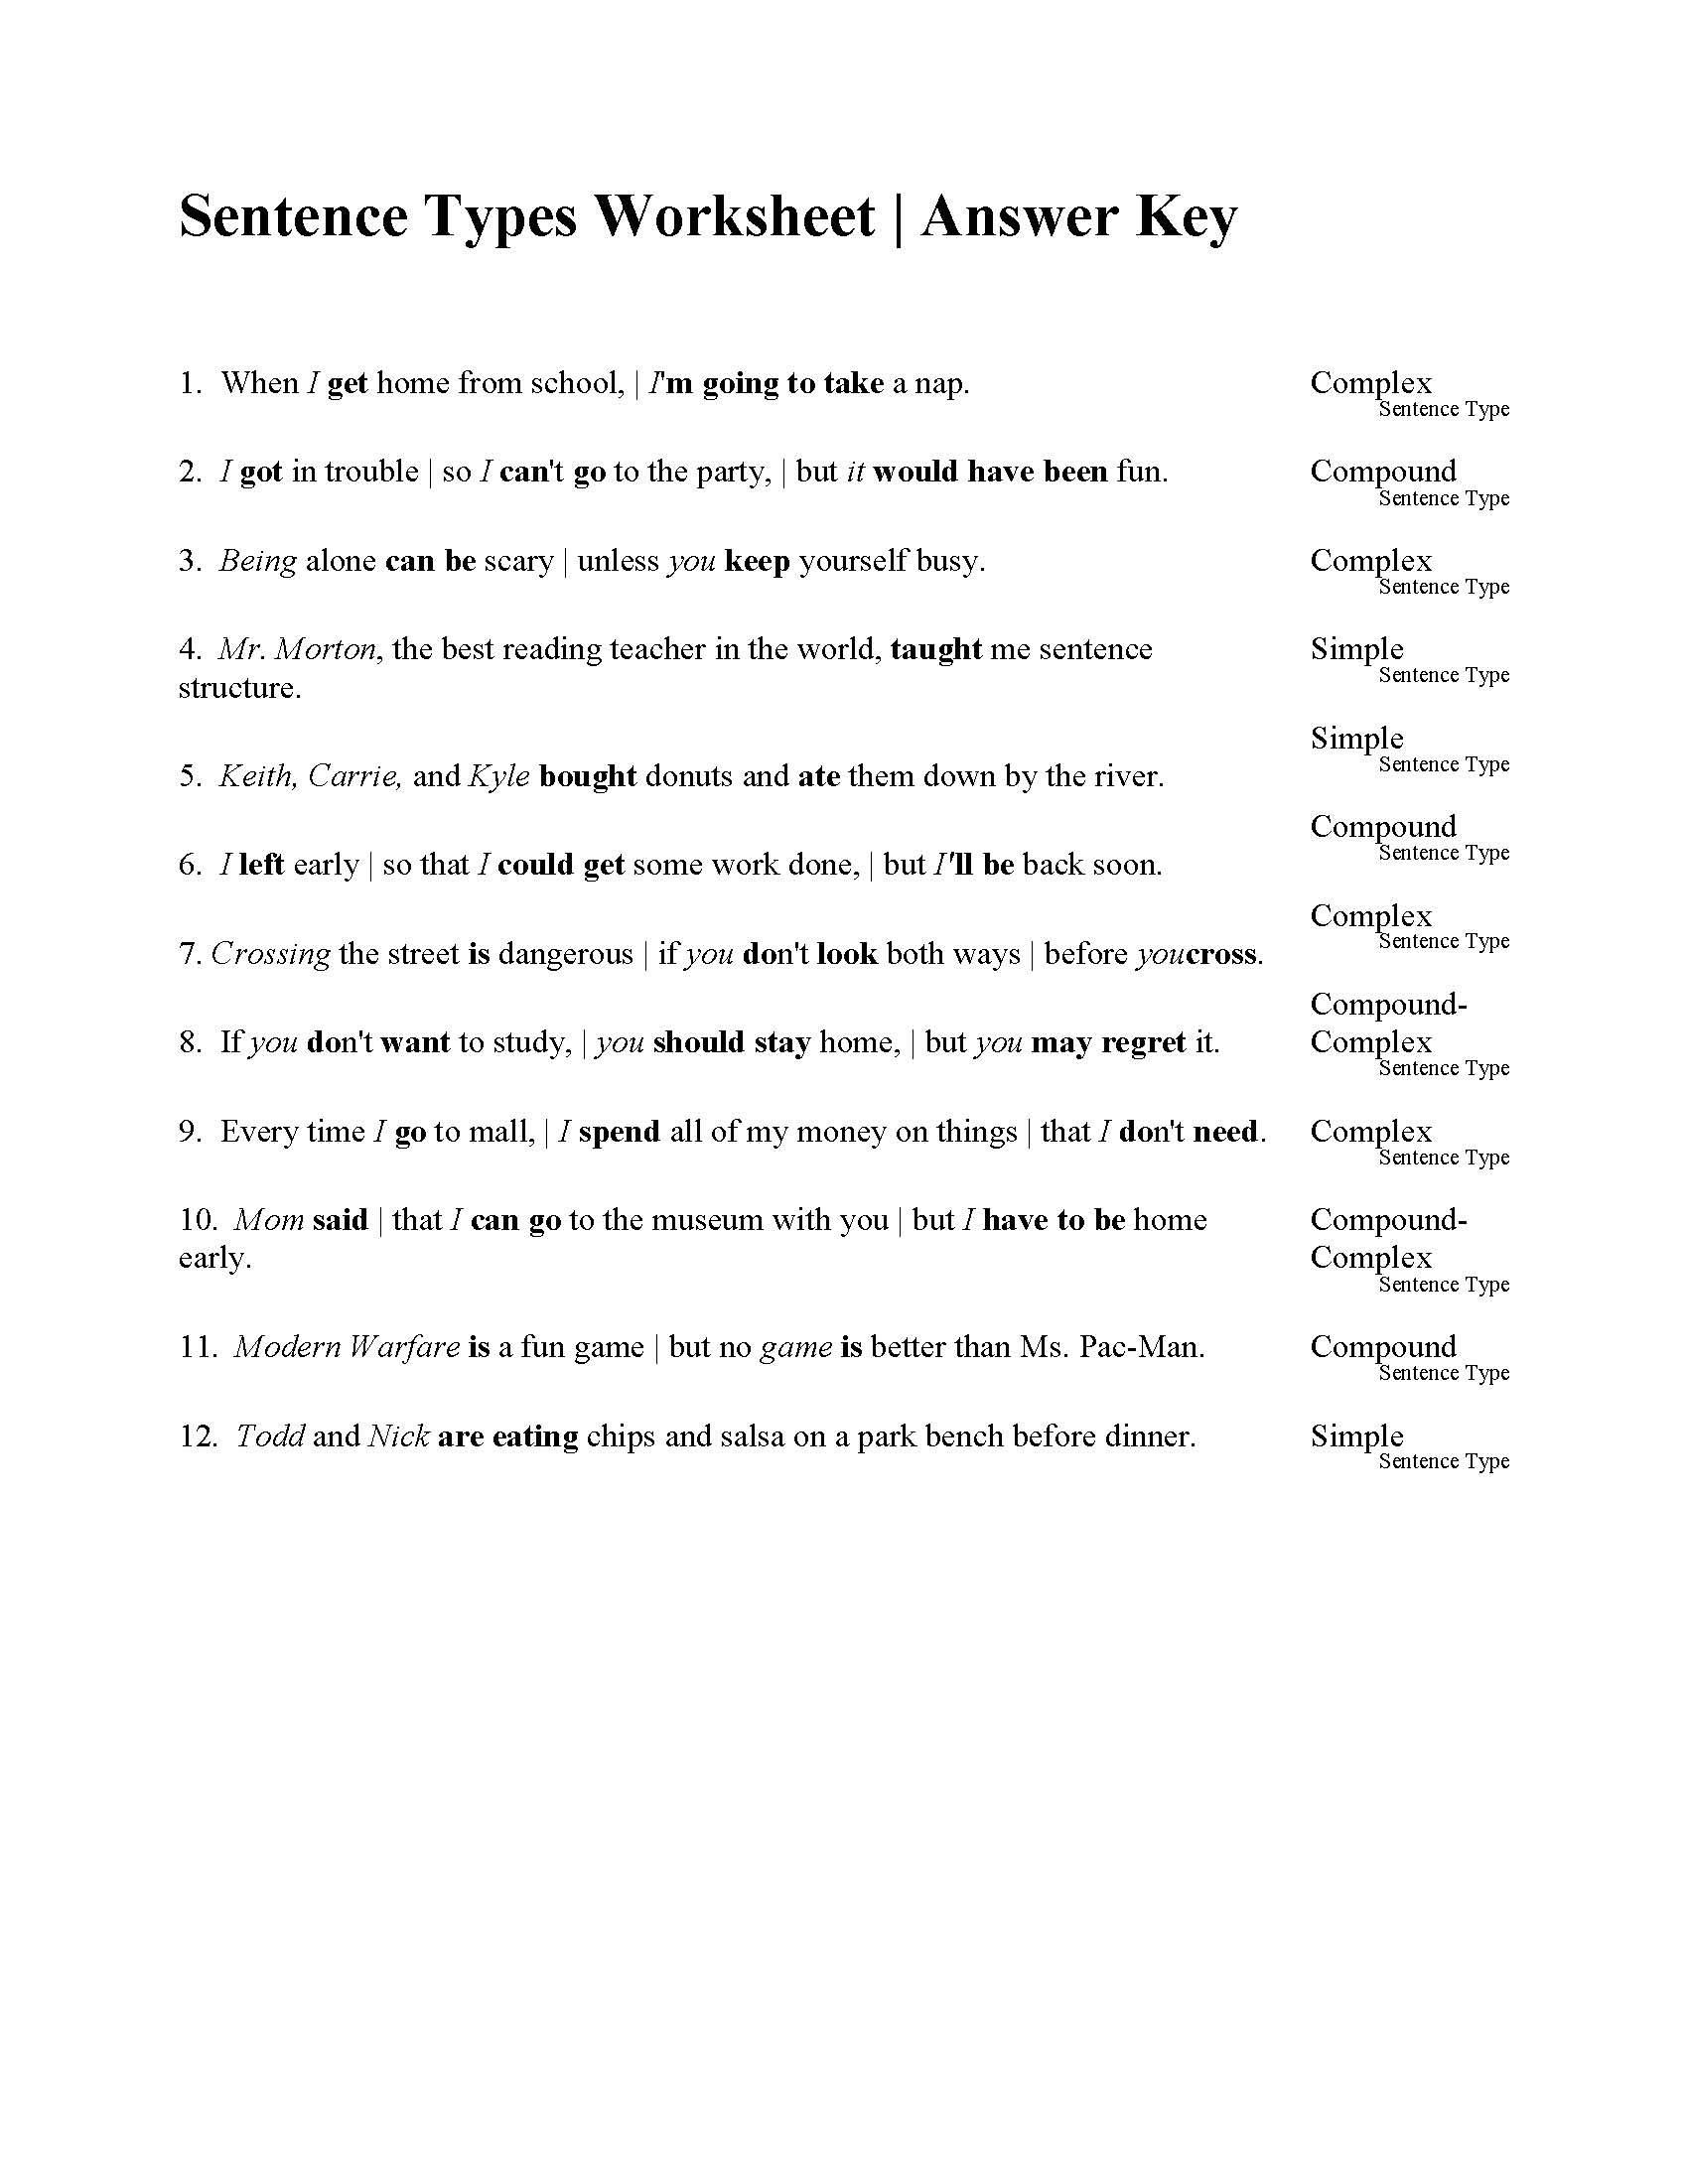 Compound and Complex Sentences Worksheet Sentences Types Worksheet